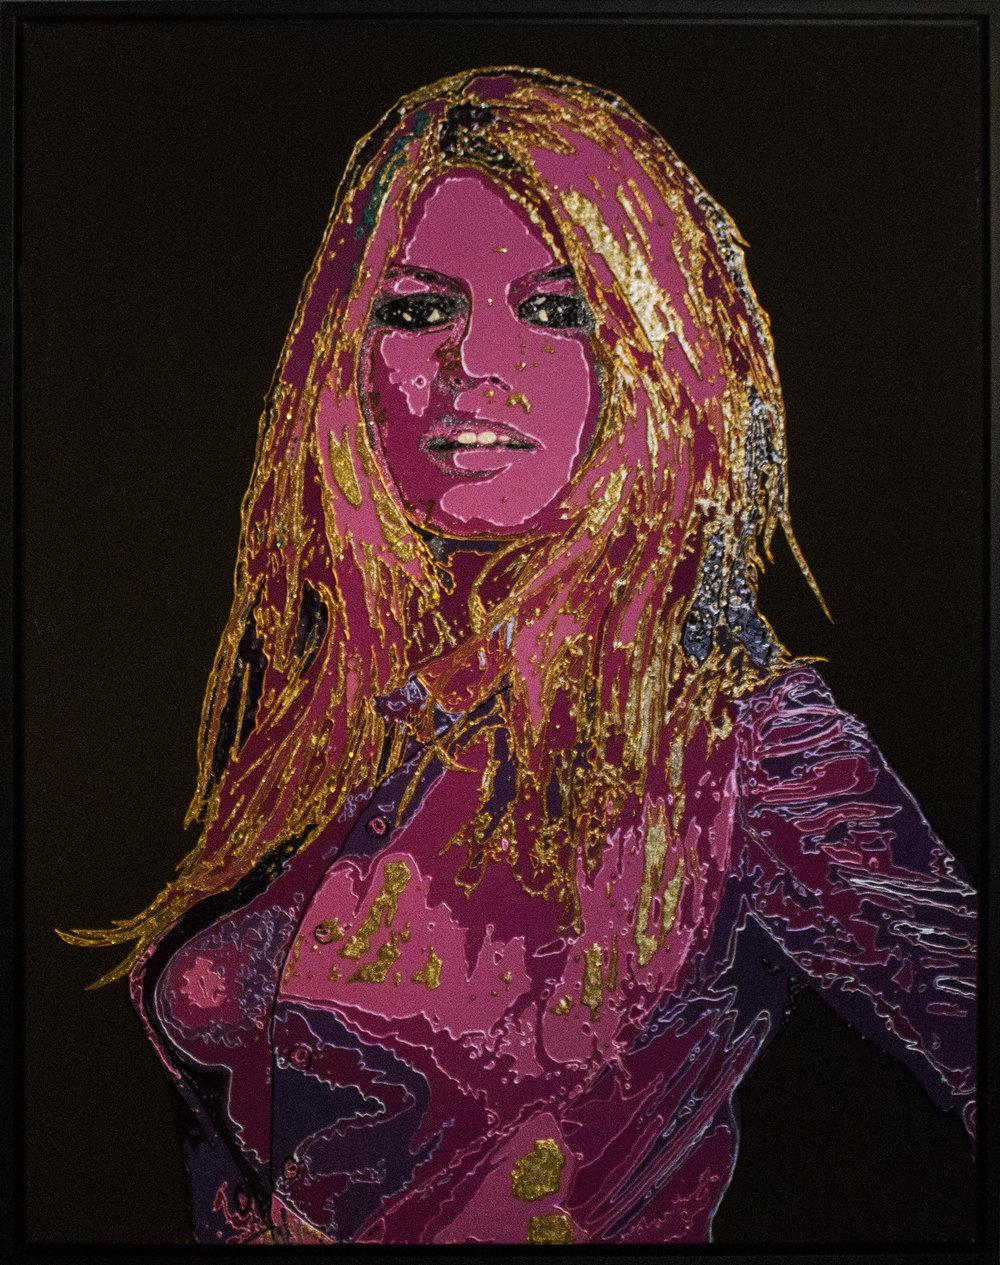 Brigitte Bardot - 2013Mixed media114 x 146 cm